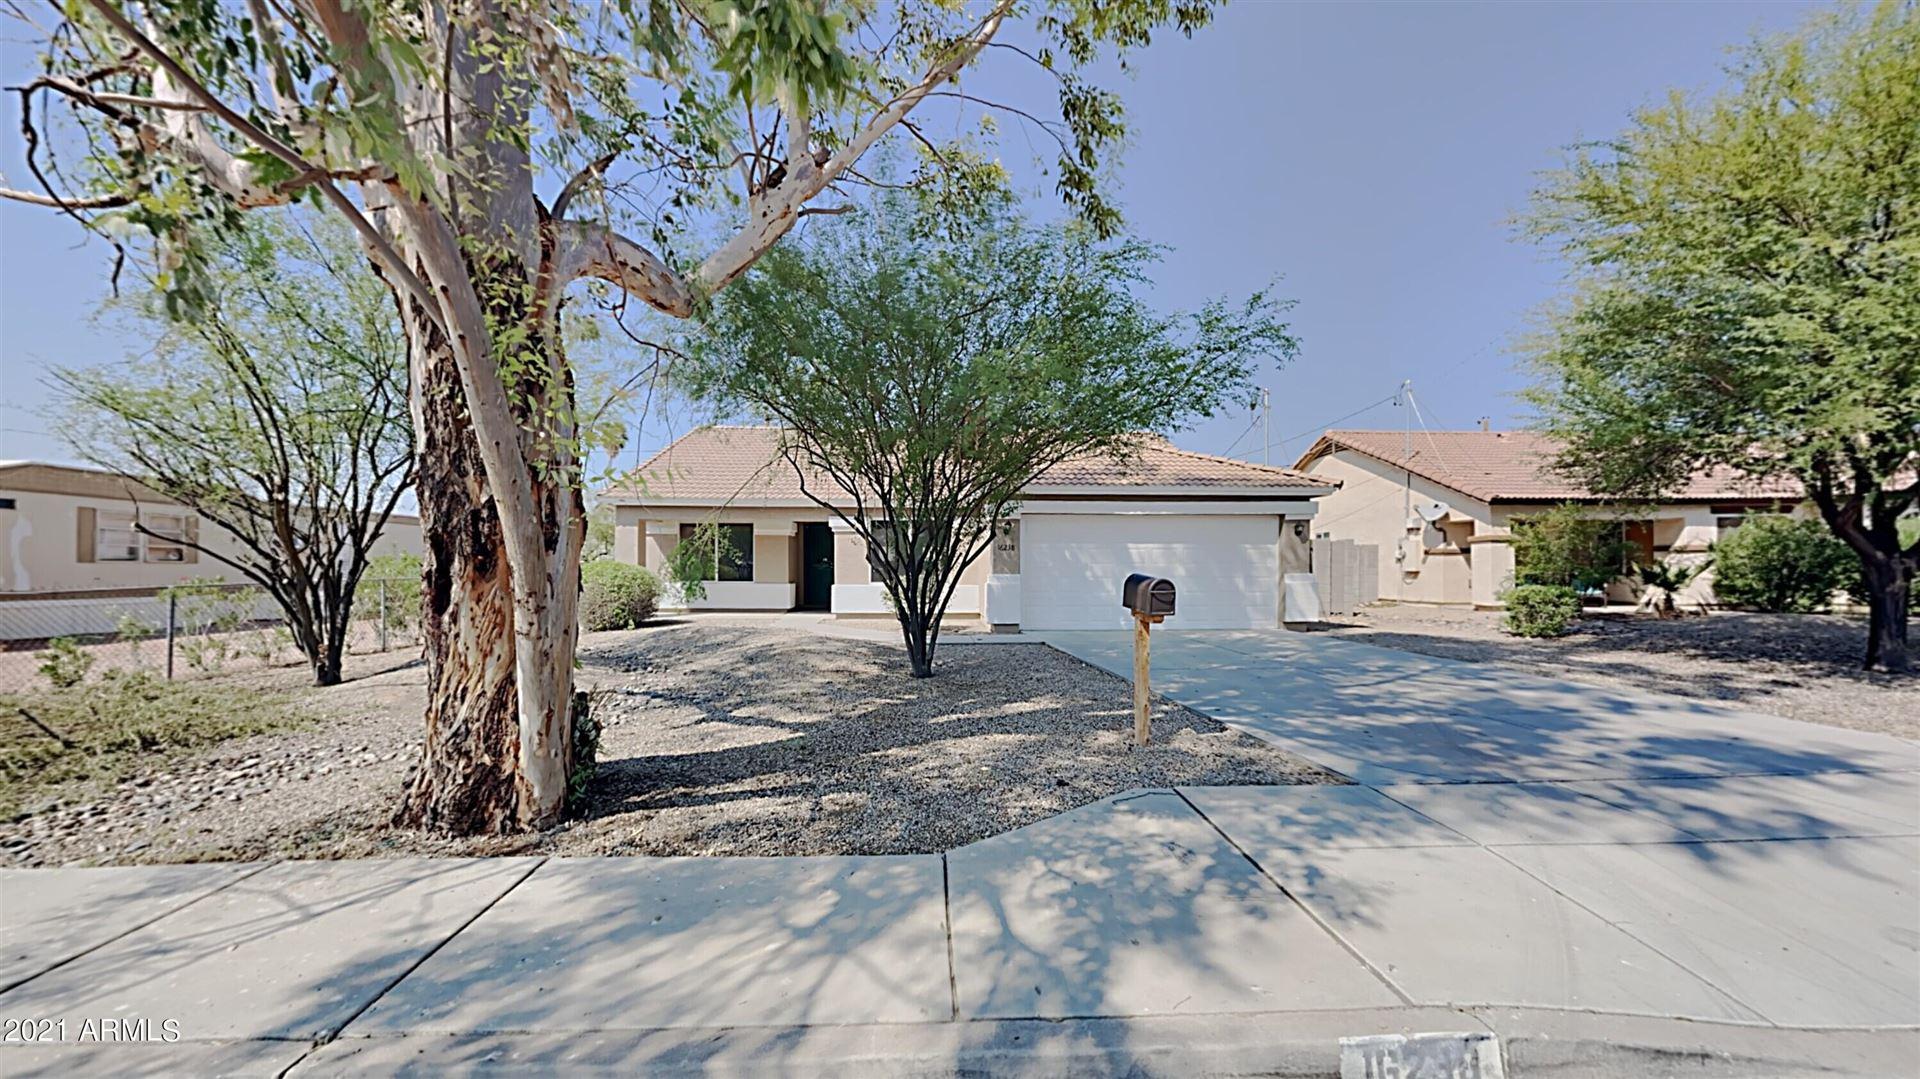 16238 N 28th Street, Phoenix, AZ 85032 - MLS#: 6296464